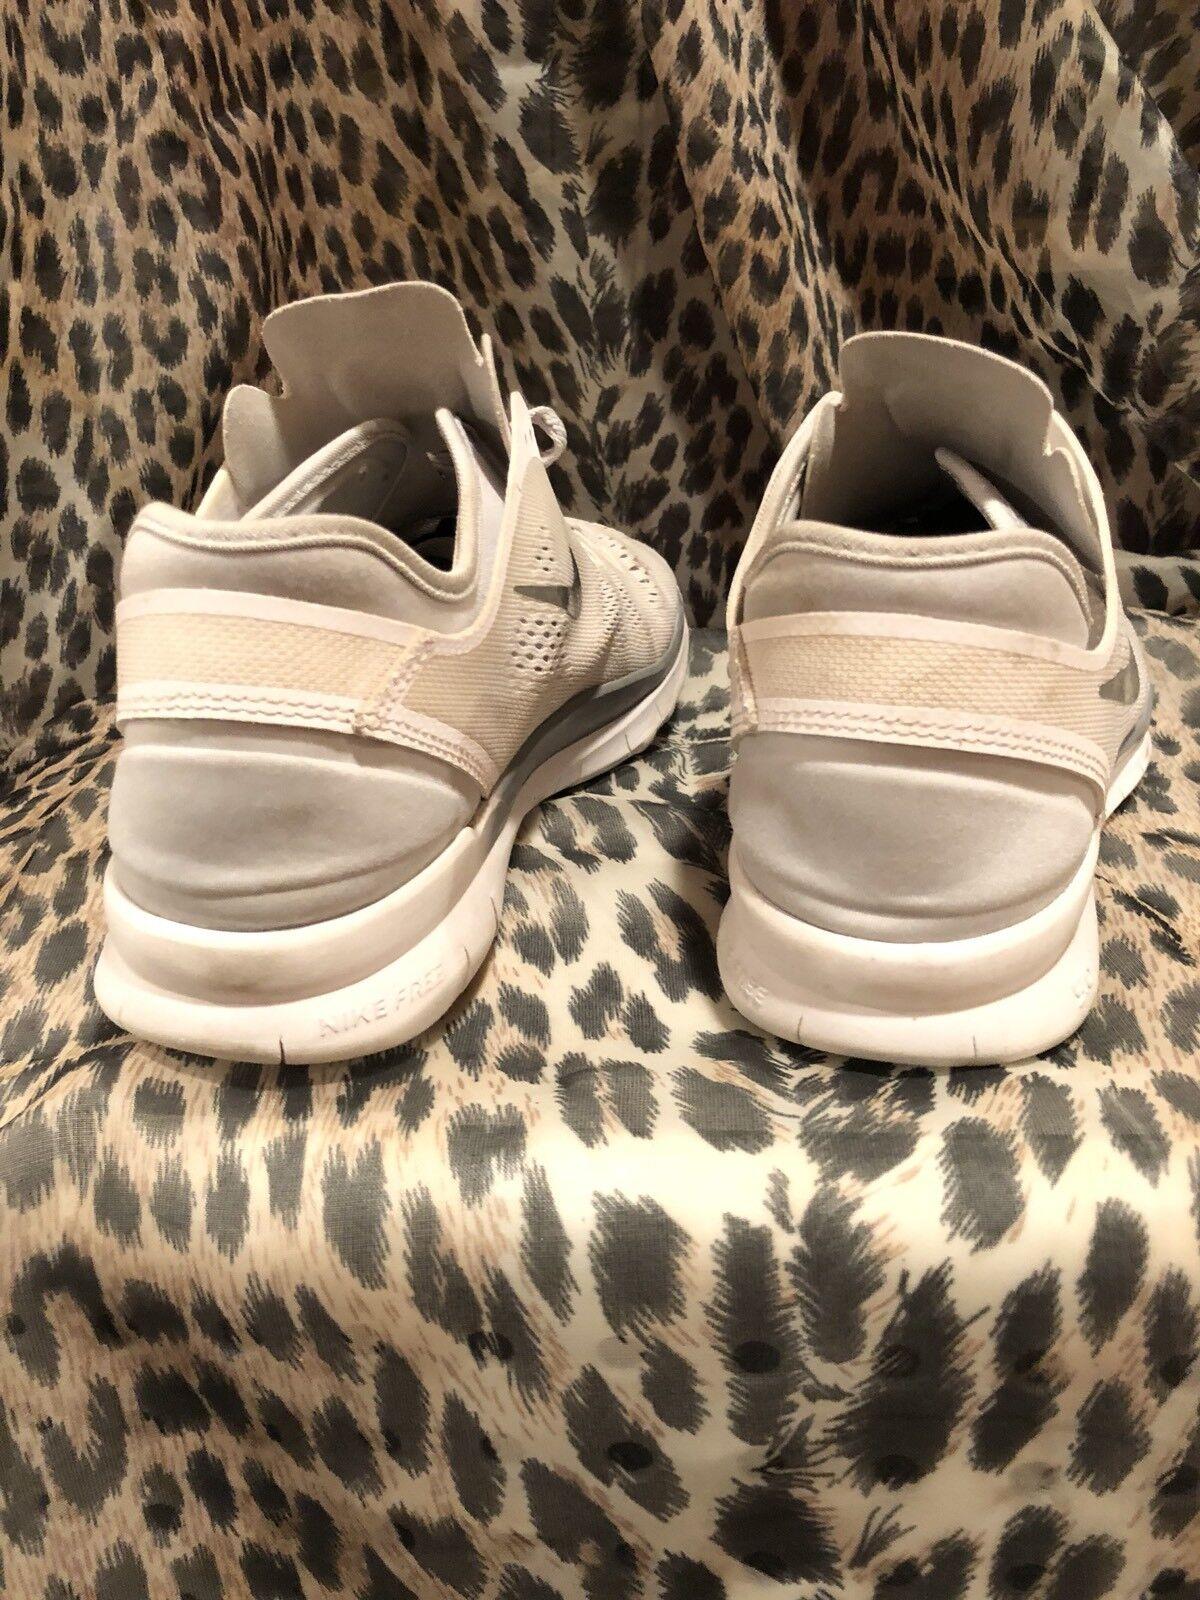 on sale 8bc11 d44d2 ... Womens 8.5 Nike Free Free Free Run 5.0 TR 5 Pure Platinum   White  704674- ...